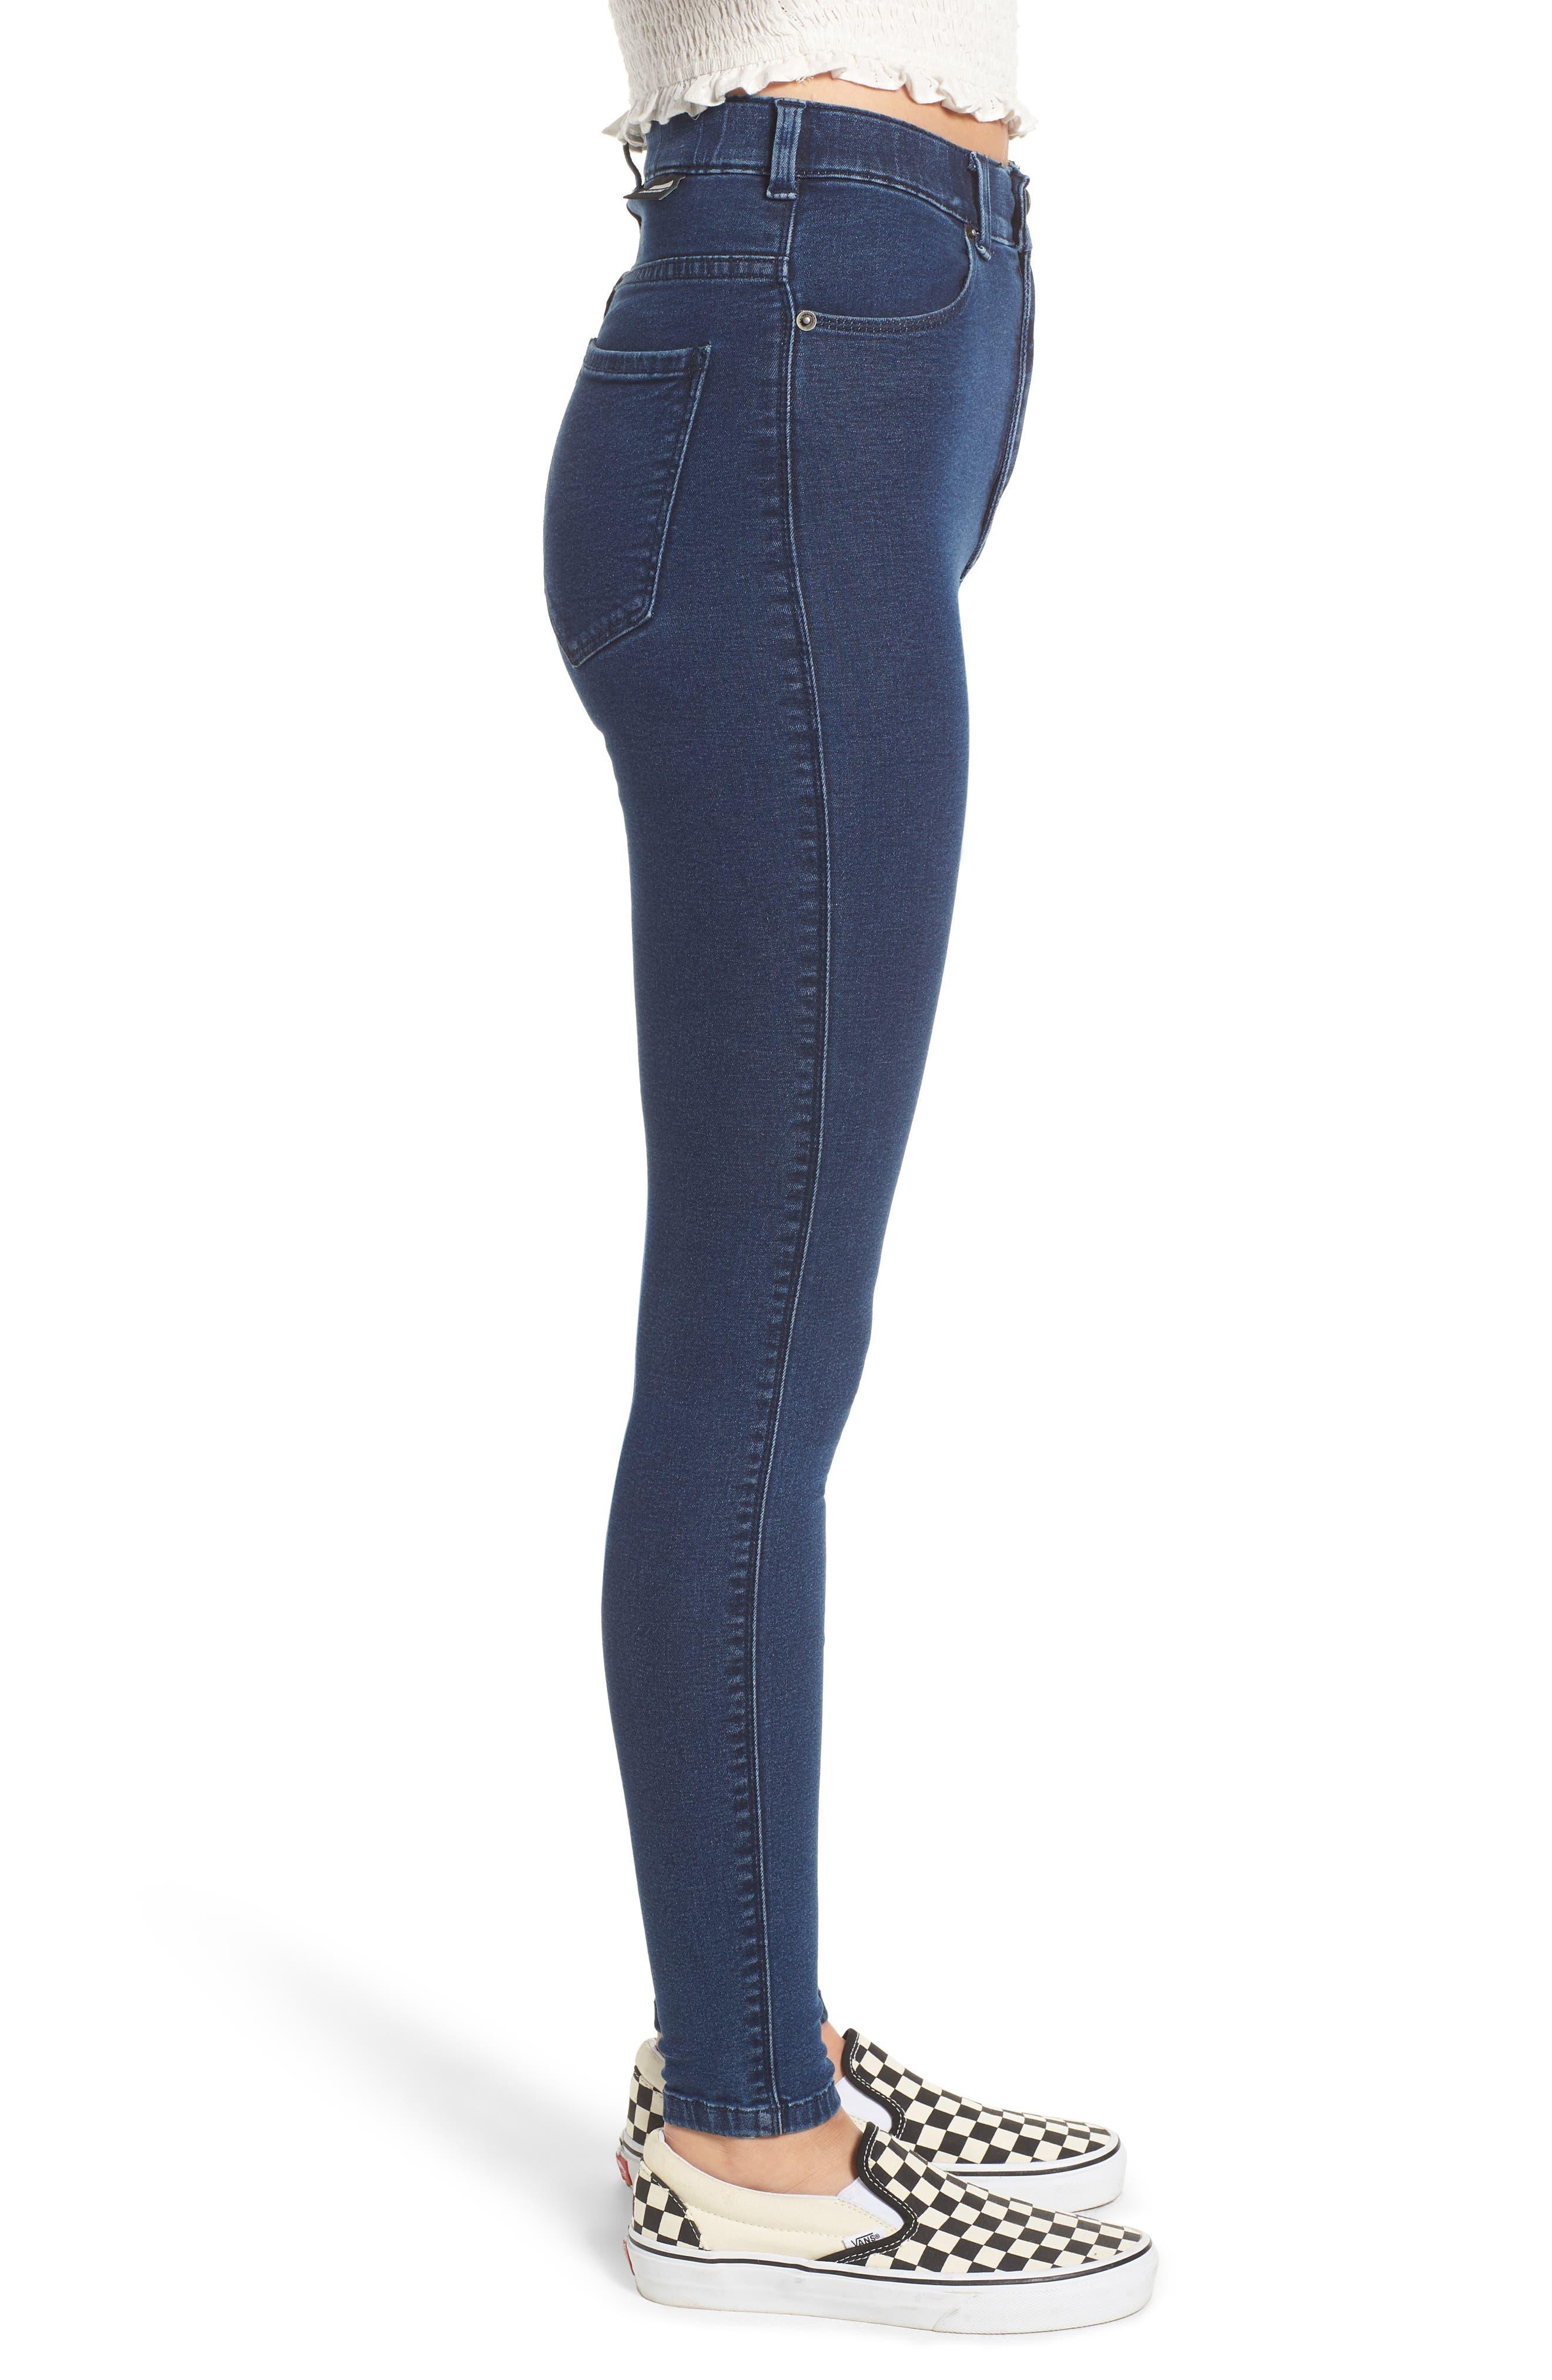 Moxy Skinny Jeans,                             Alternate thumbnail 3, color,                             400